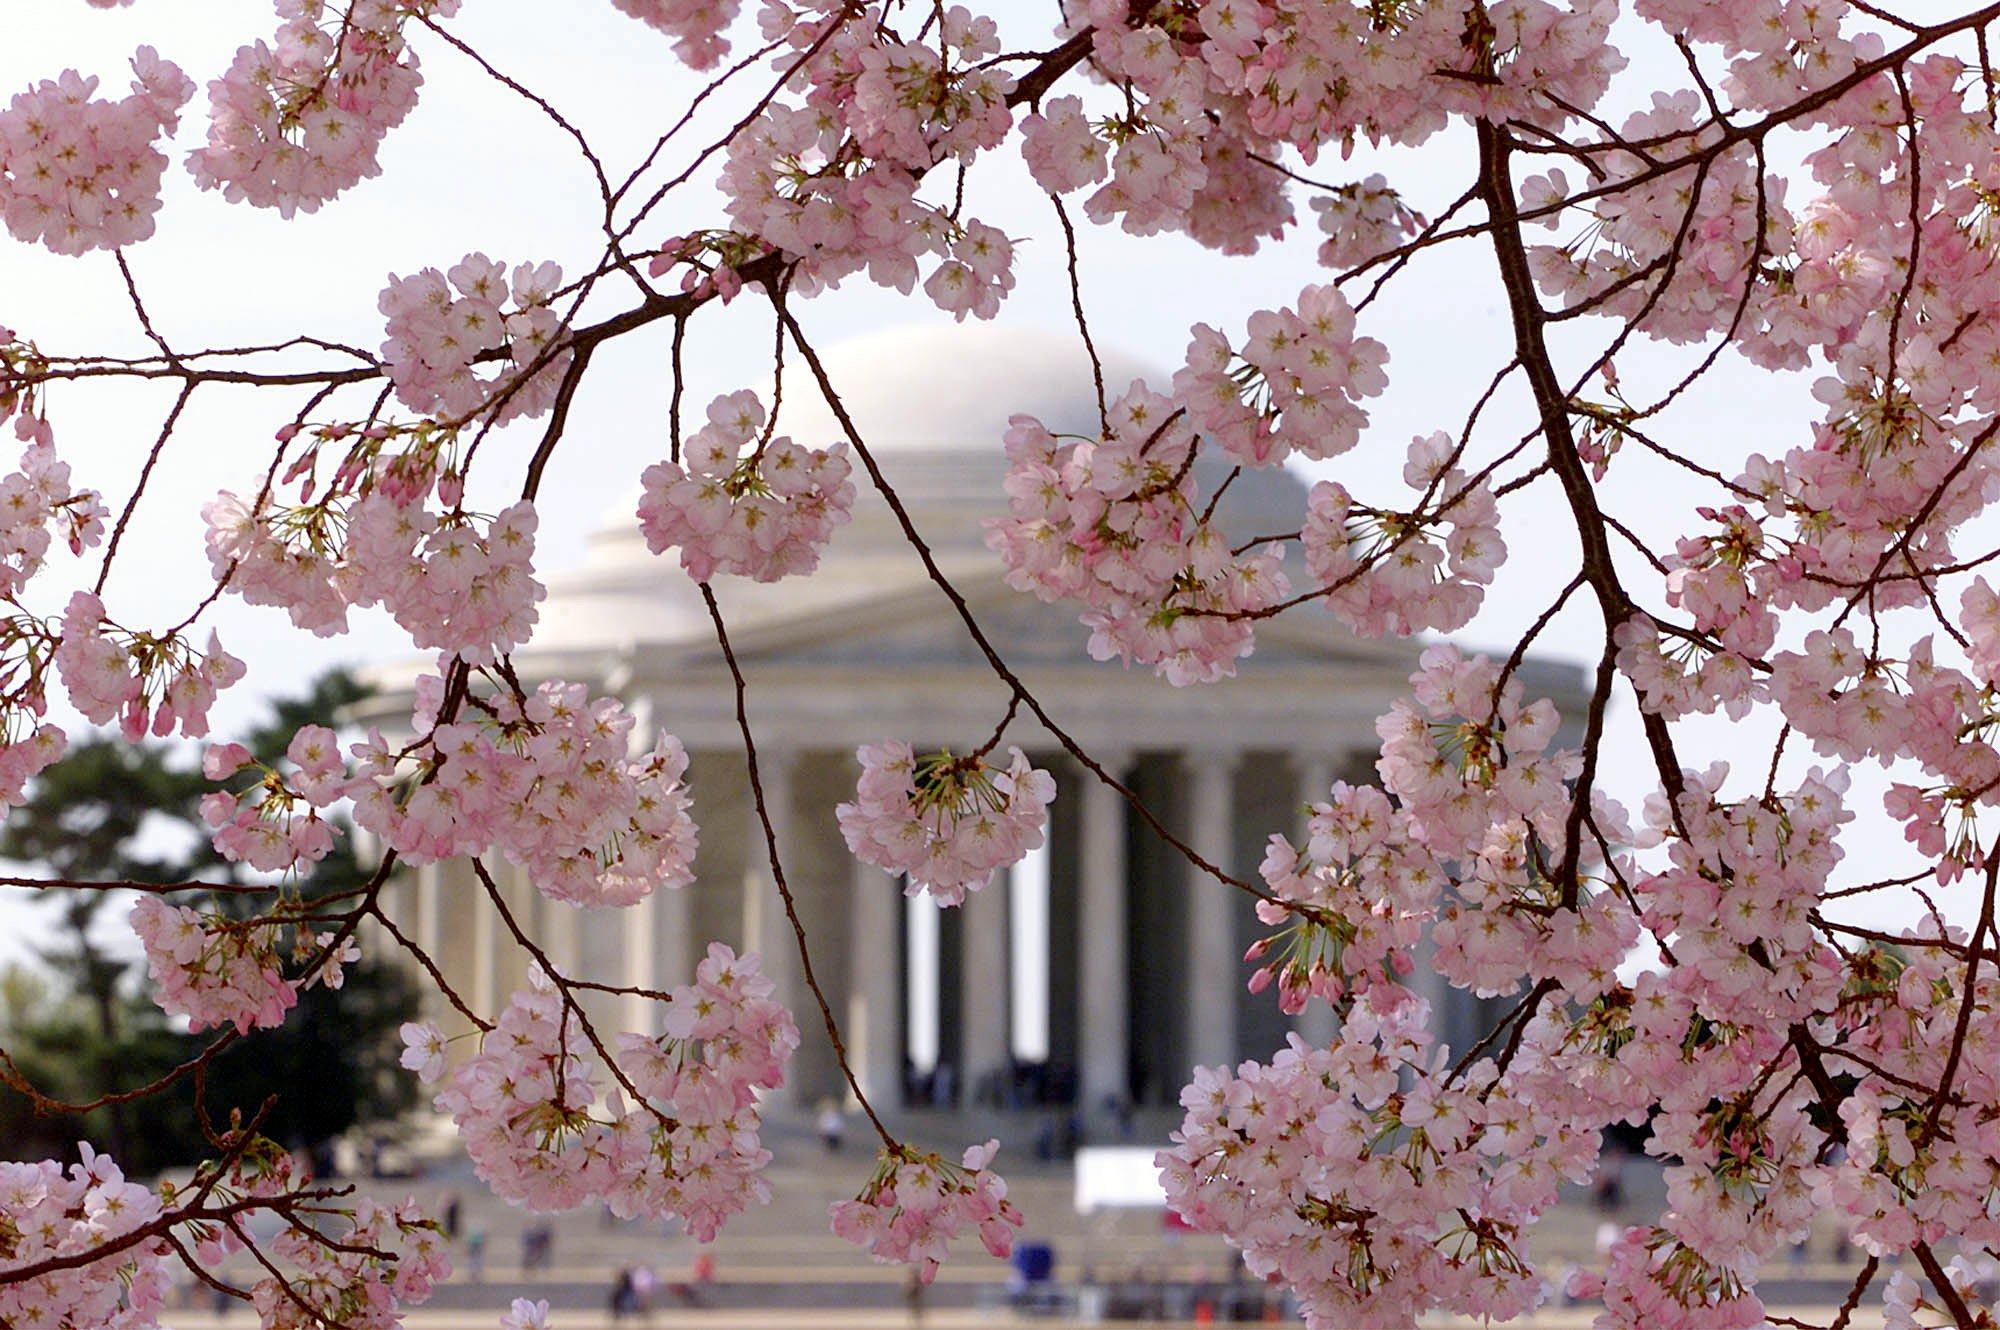 cherry blossom festival - HD2000×1330